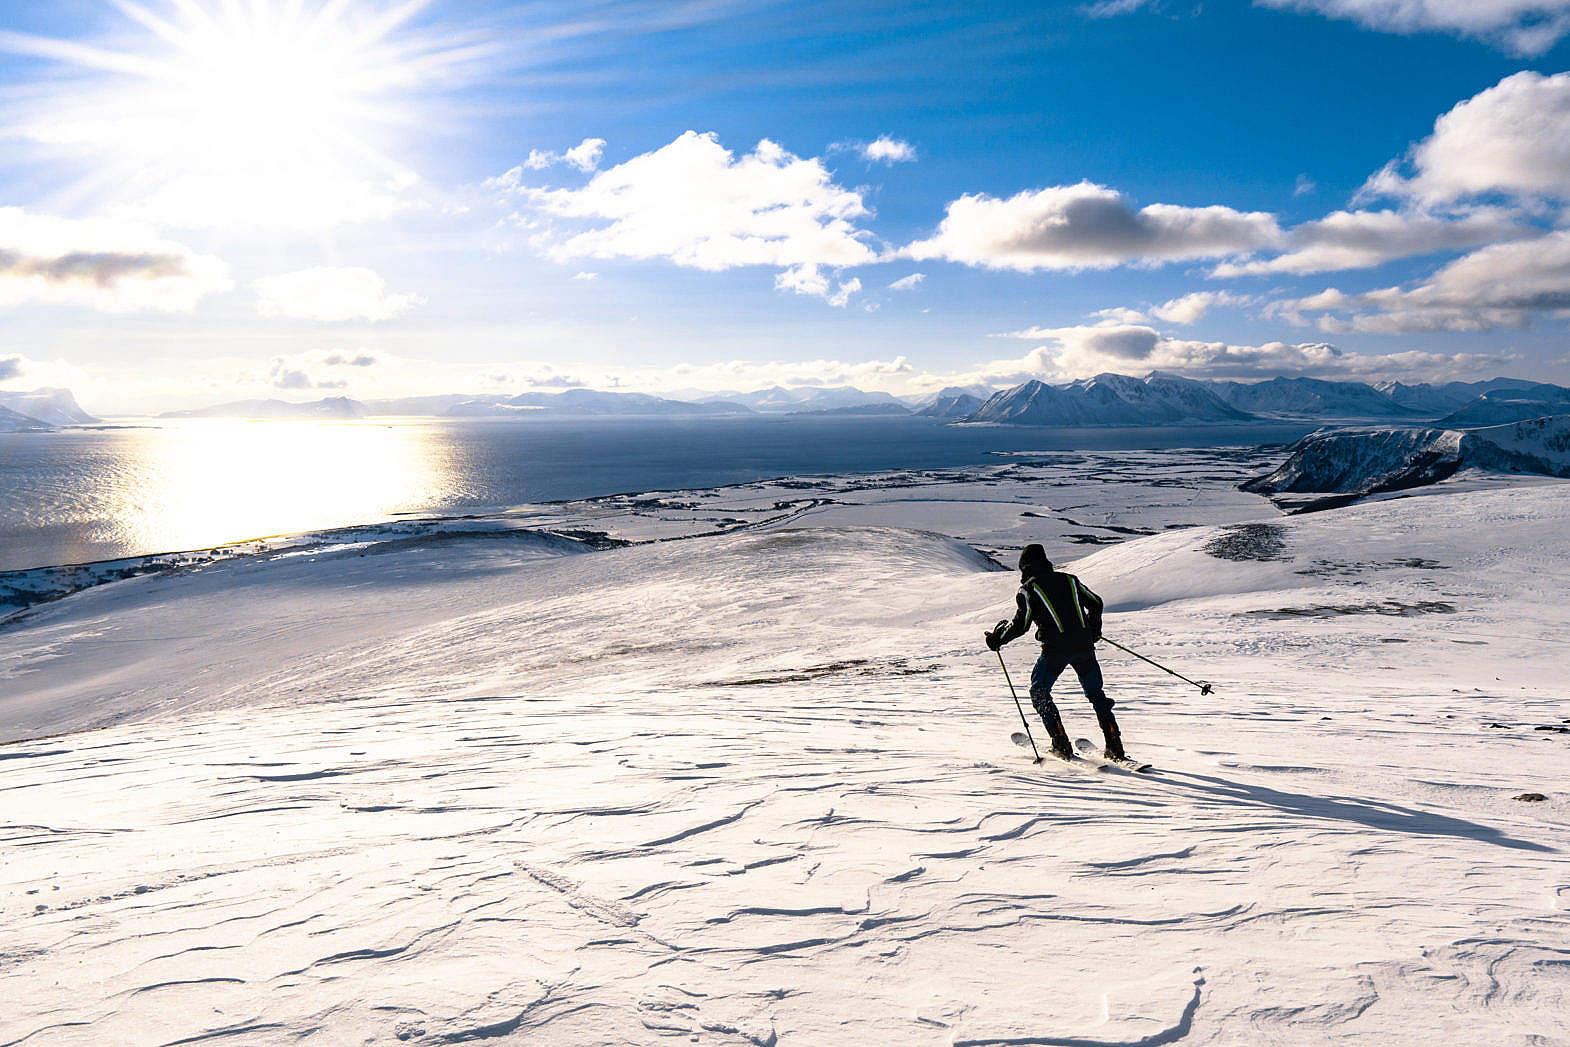 Man Skiing on Snowy Mountains of Norway Stock Photo picjumbo 1570x1047